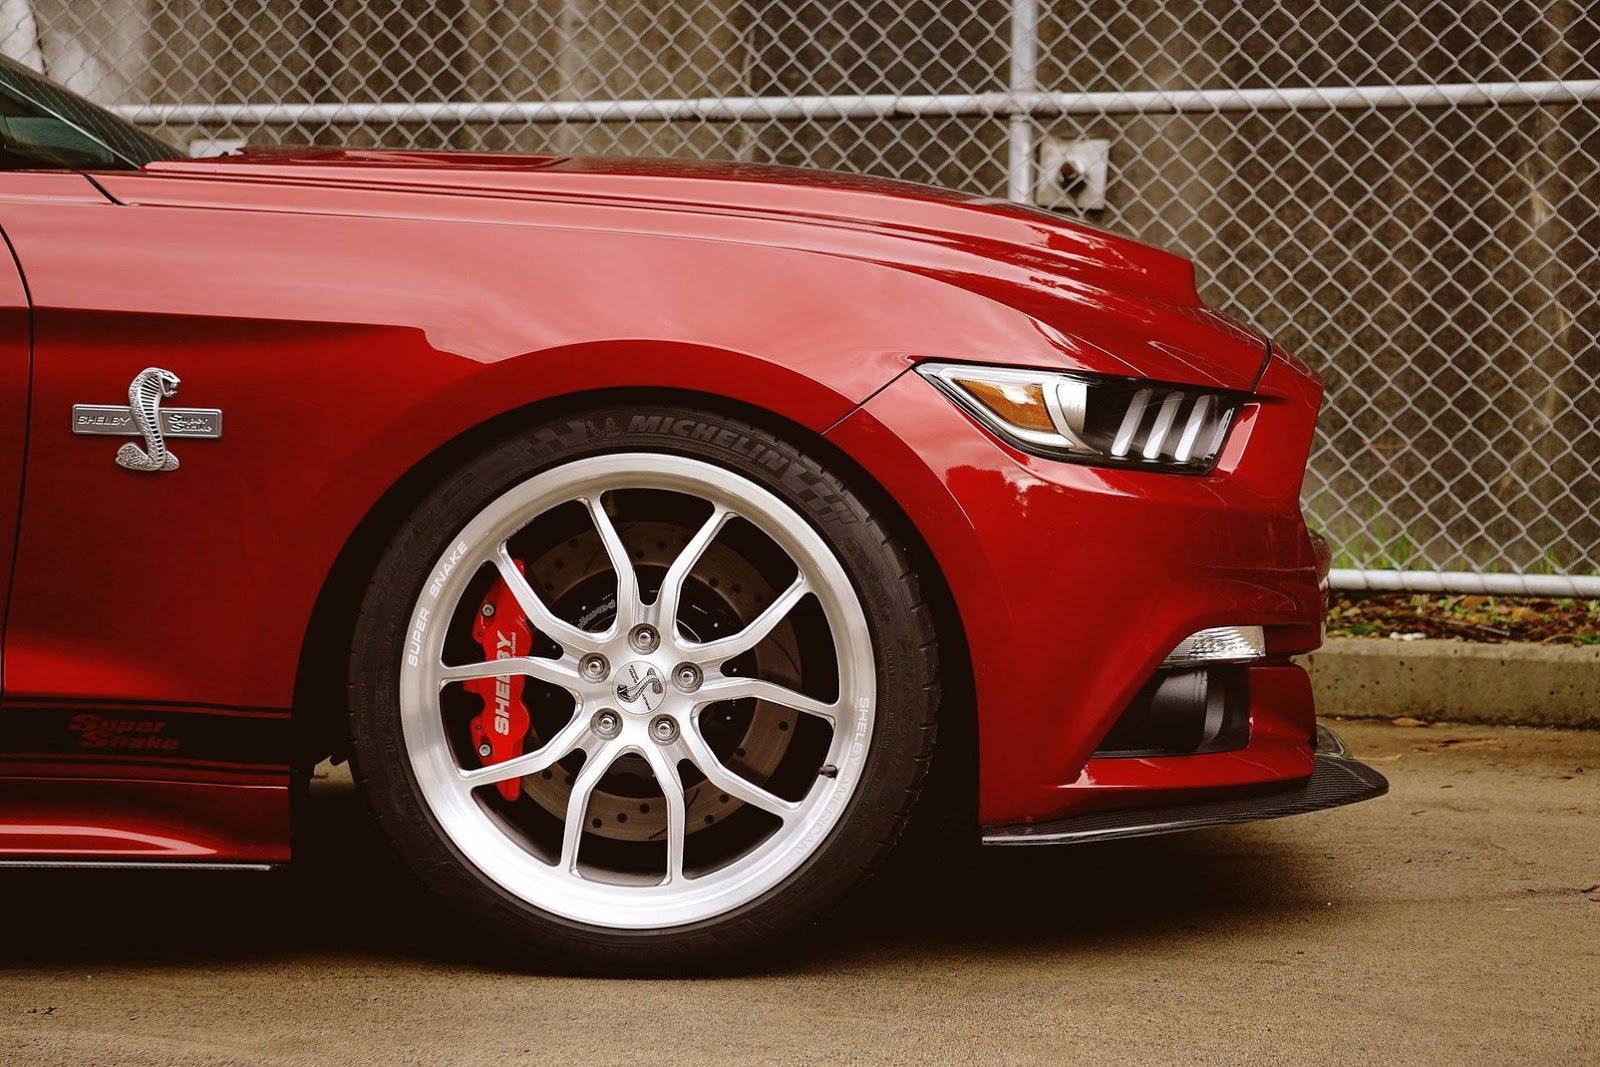 Ford Mustang Shelby Super Snake Rhd In Australia Paul Tan